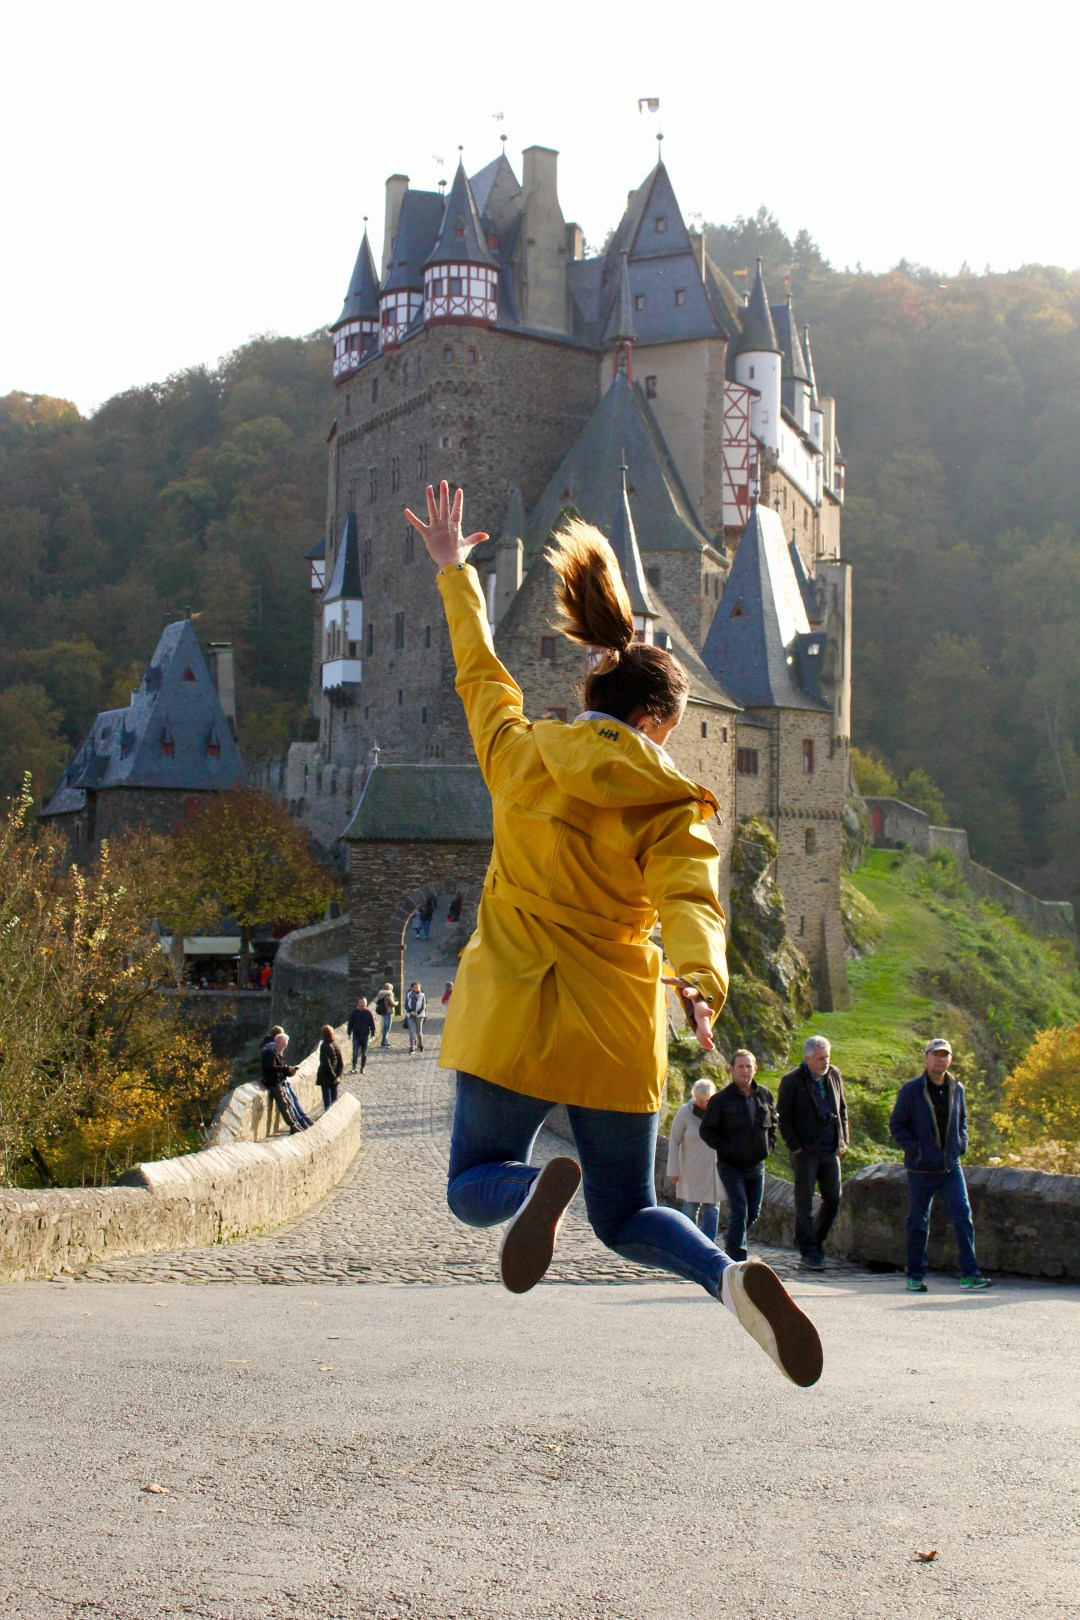 Jumping for joy at Burg Eltz, Germany